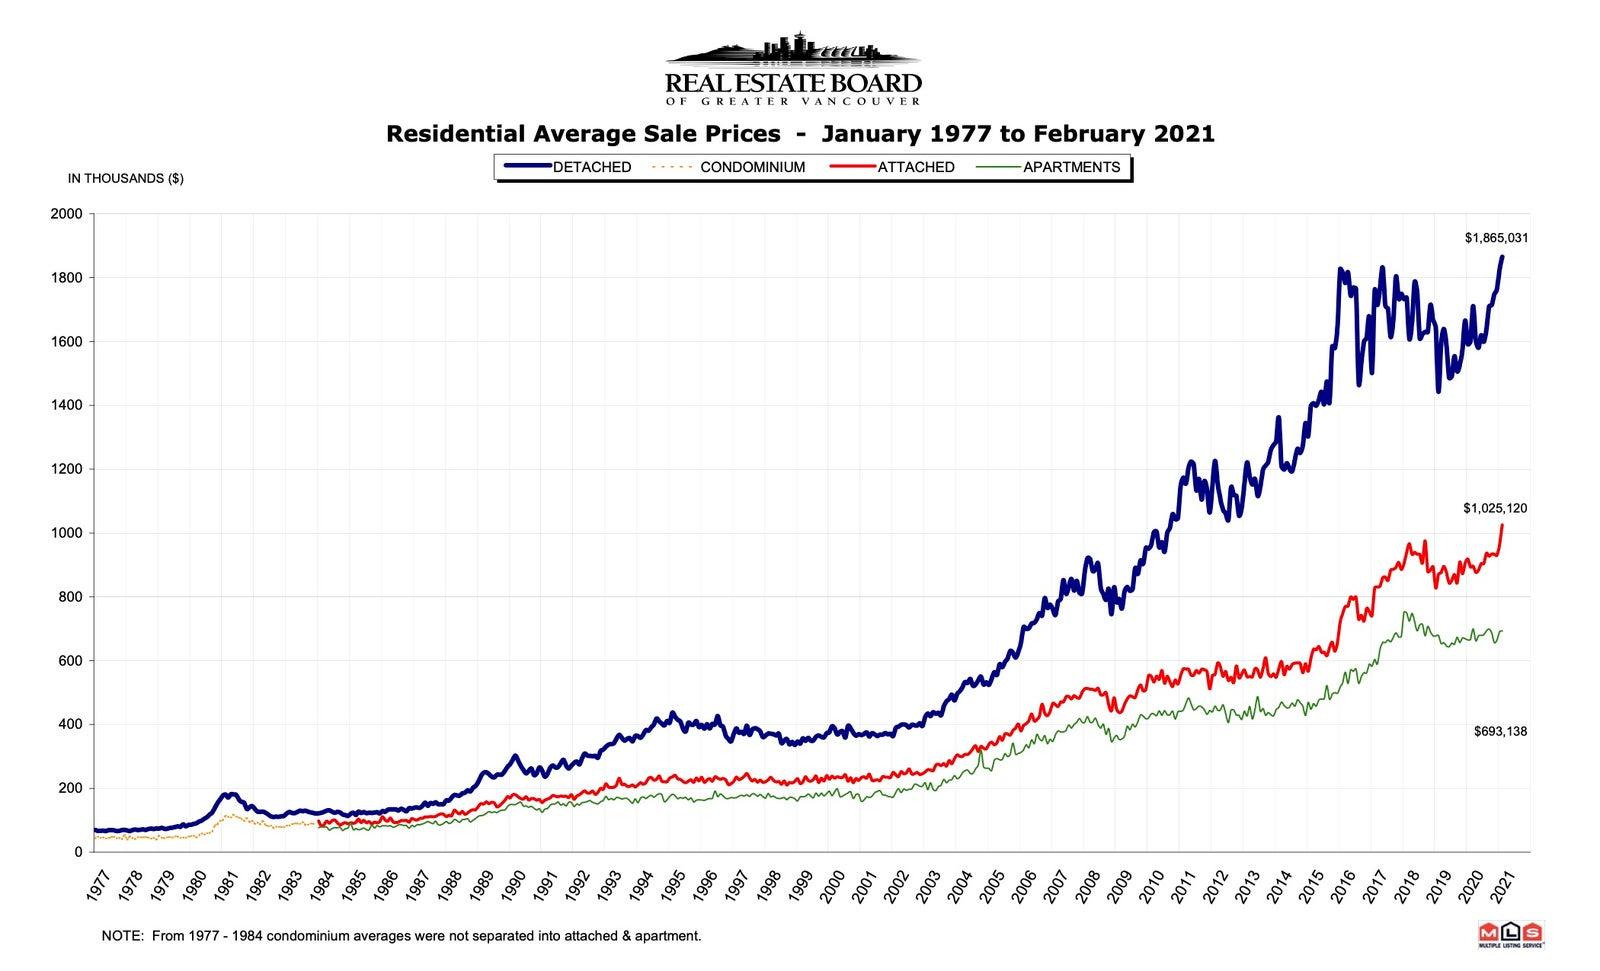 REBGV House Prices - Feb 2021